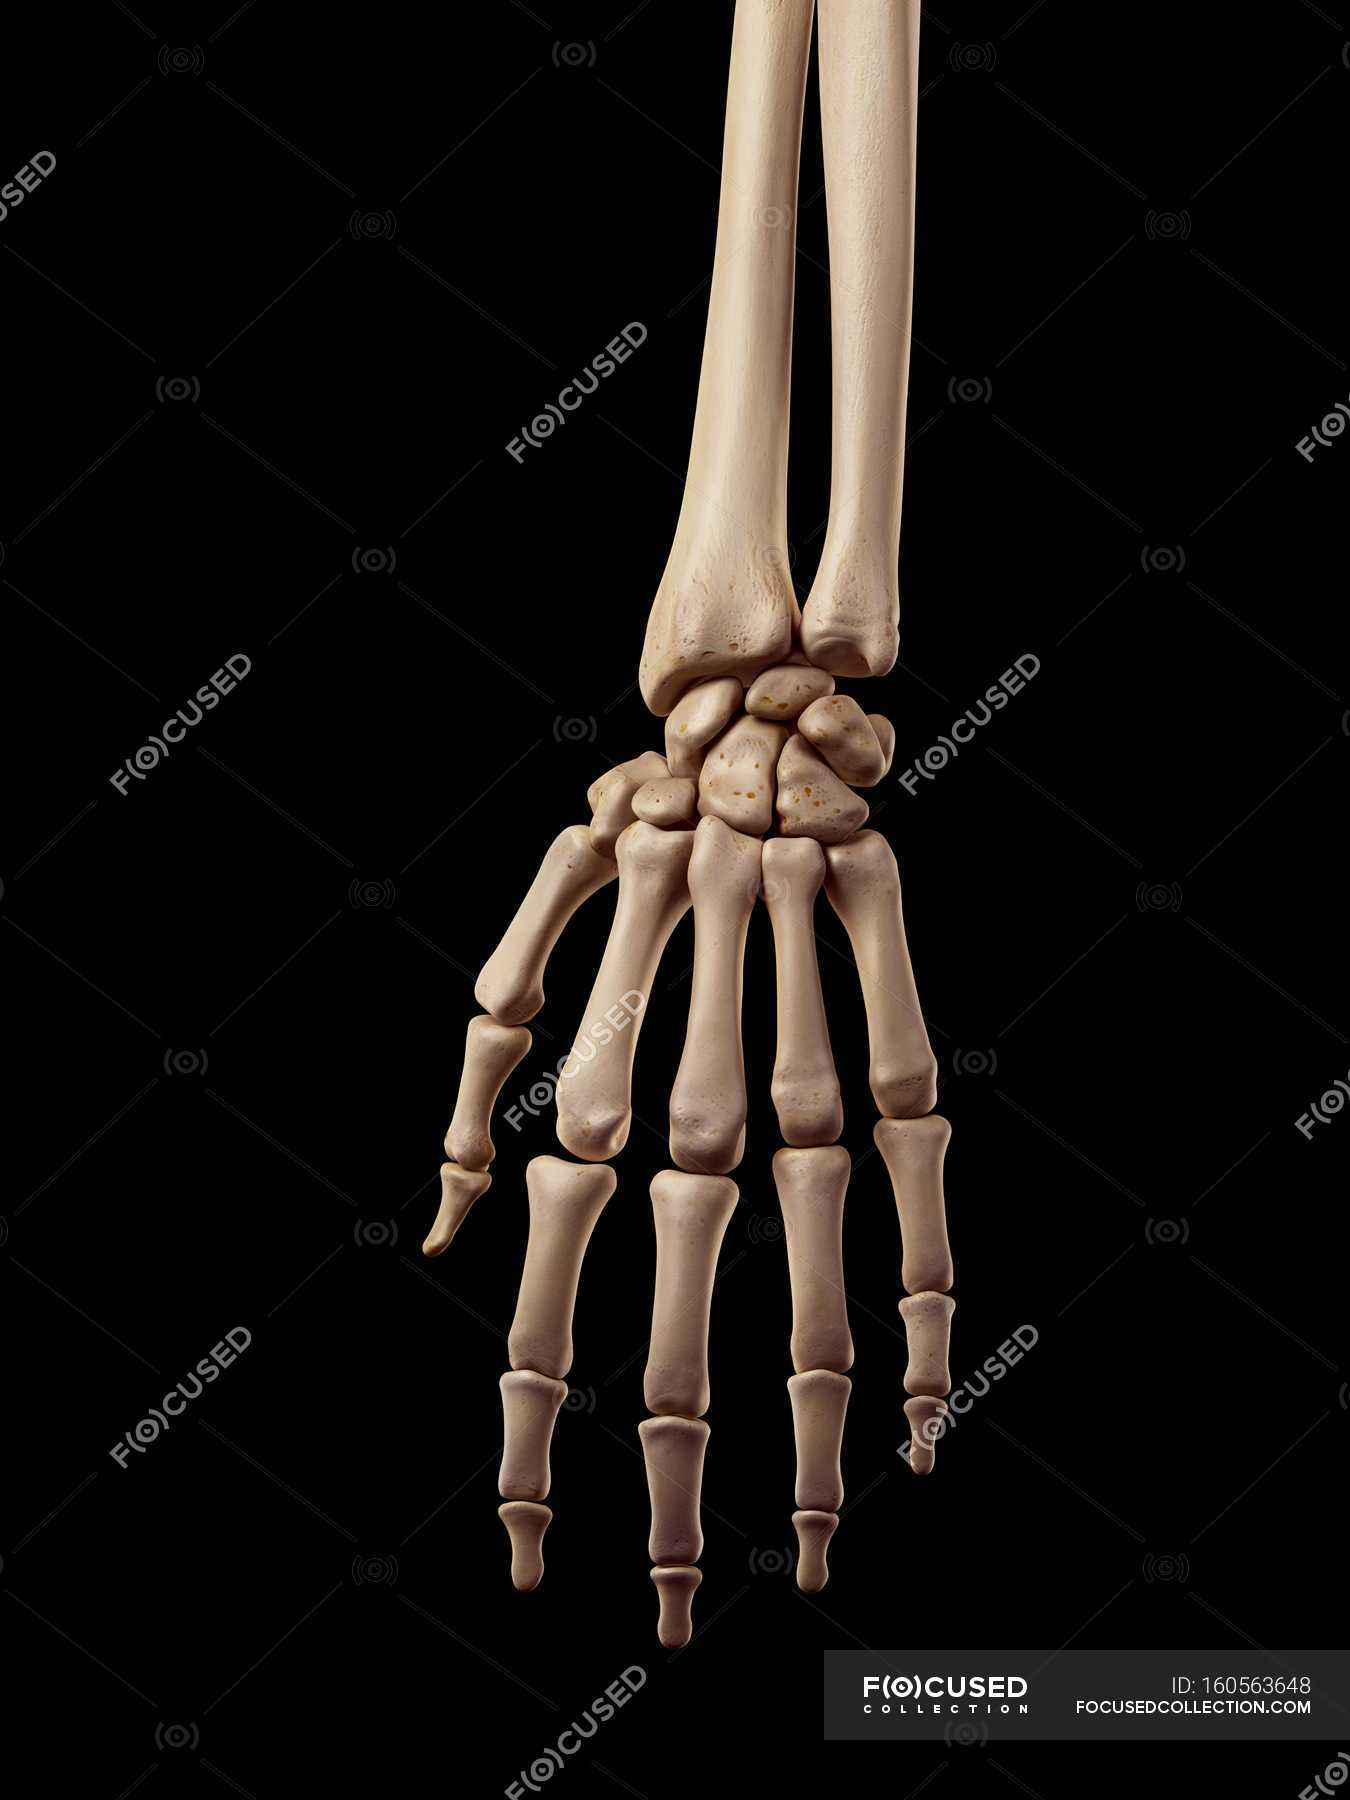 Human hand bones anatomy — Stock Photo | #160563648